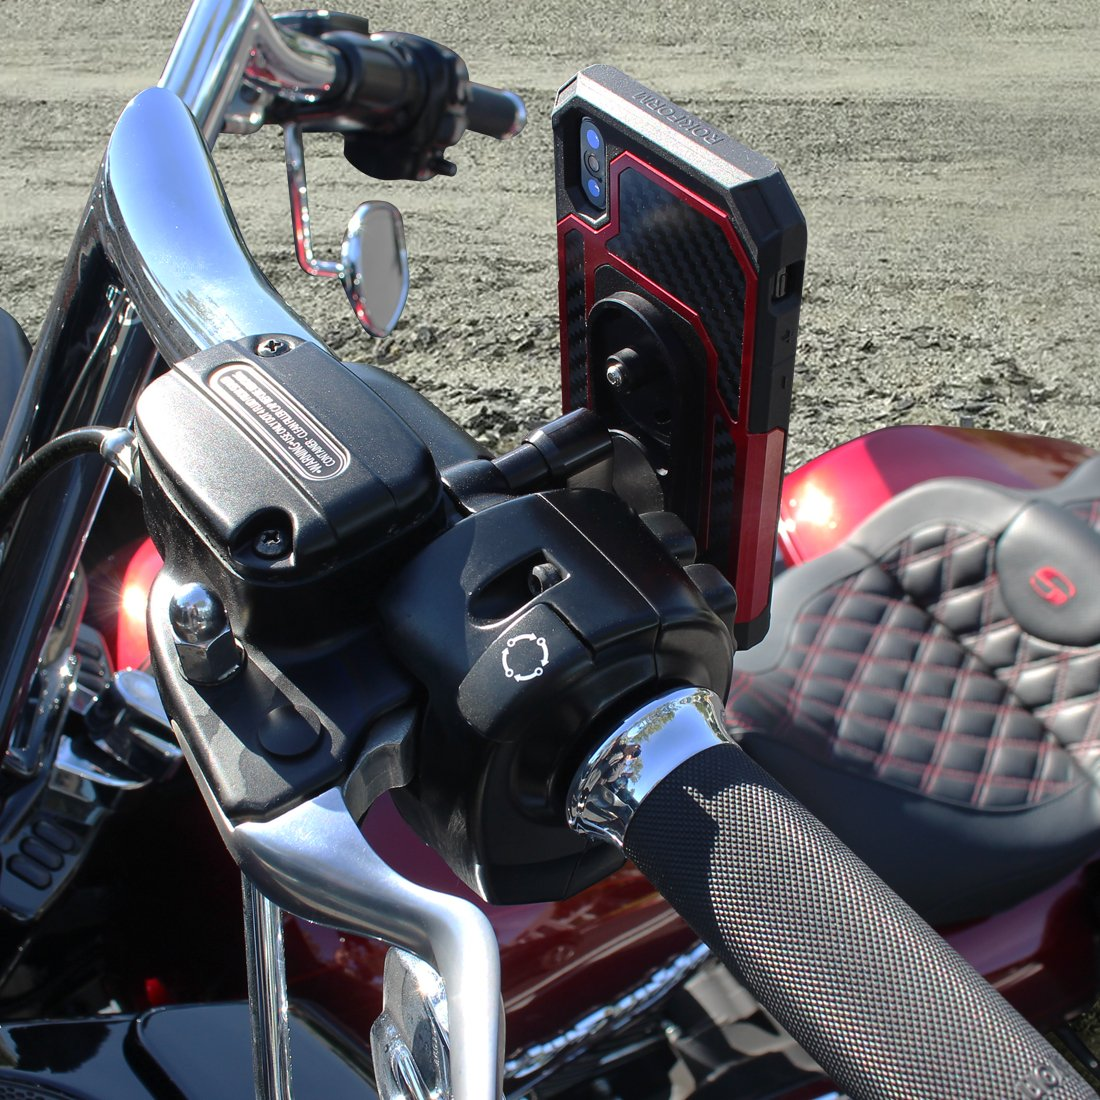 Rokform Motorcycle Perch Mount Baum Customs